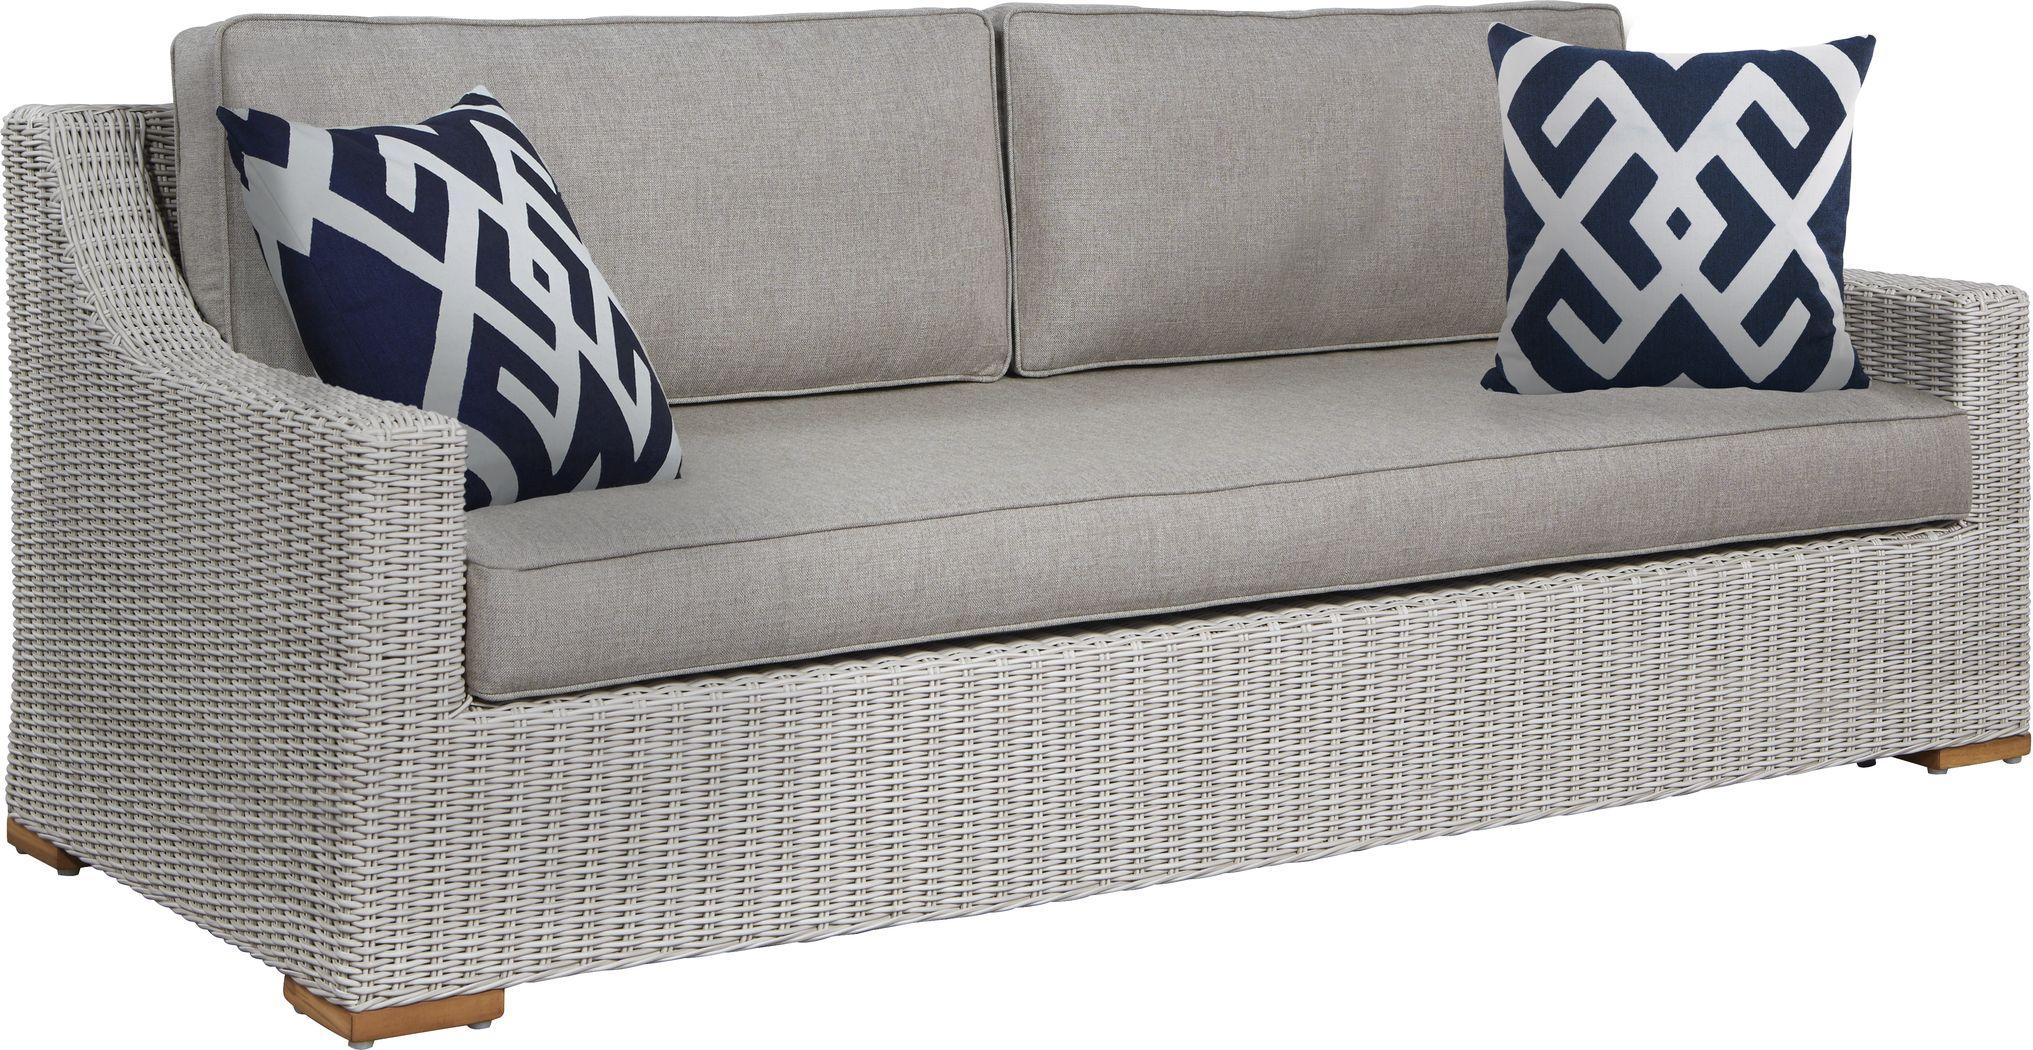 Patmos Gray Outdoor Sofa with Mushroom Cushions